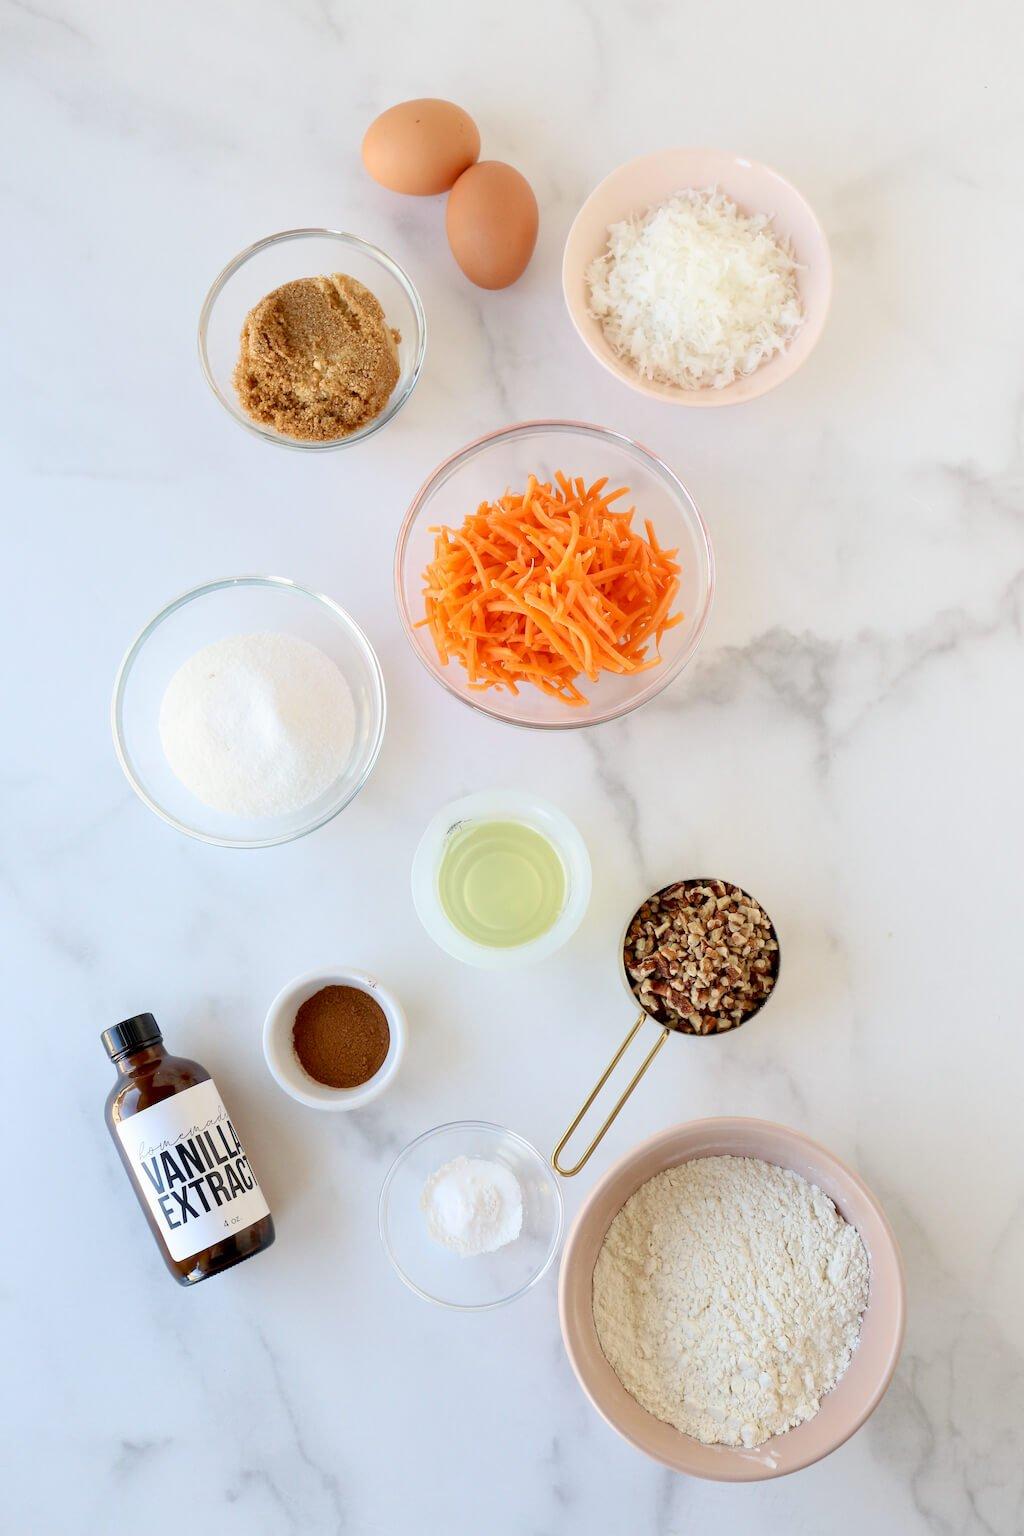 small bowls of flour, sugar, baking powder, baking soda, pecans, coconut and carrot